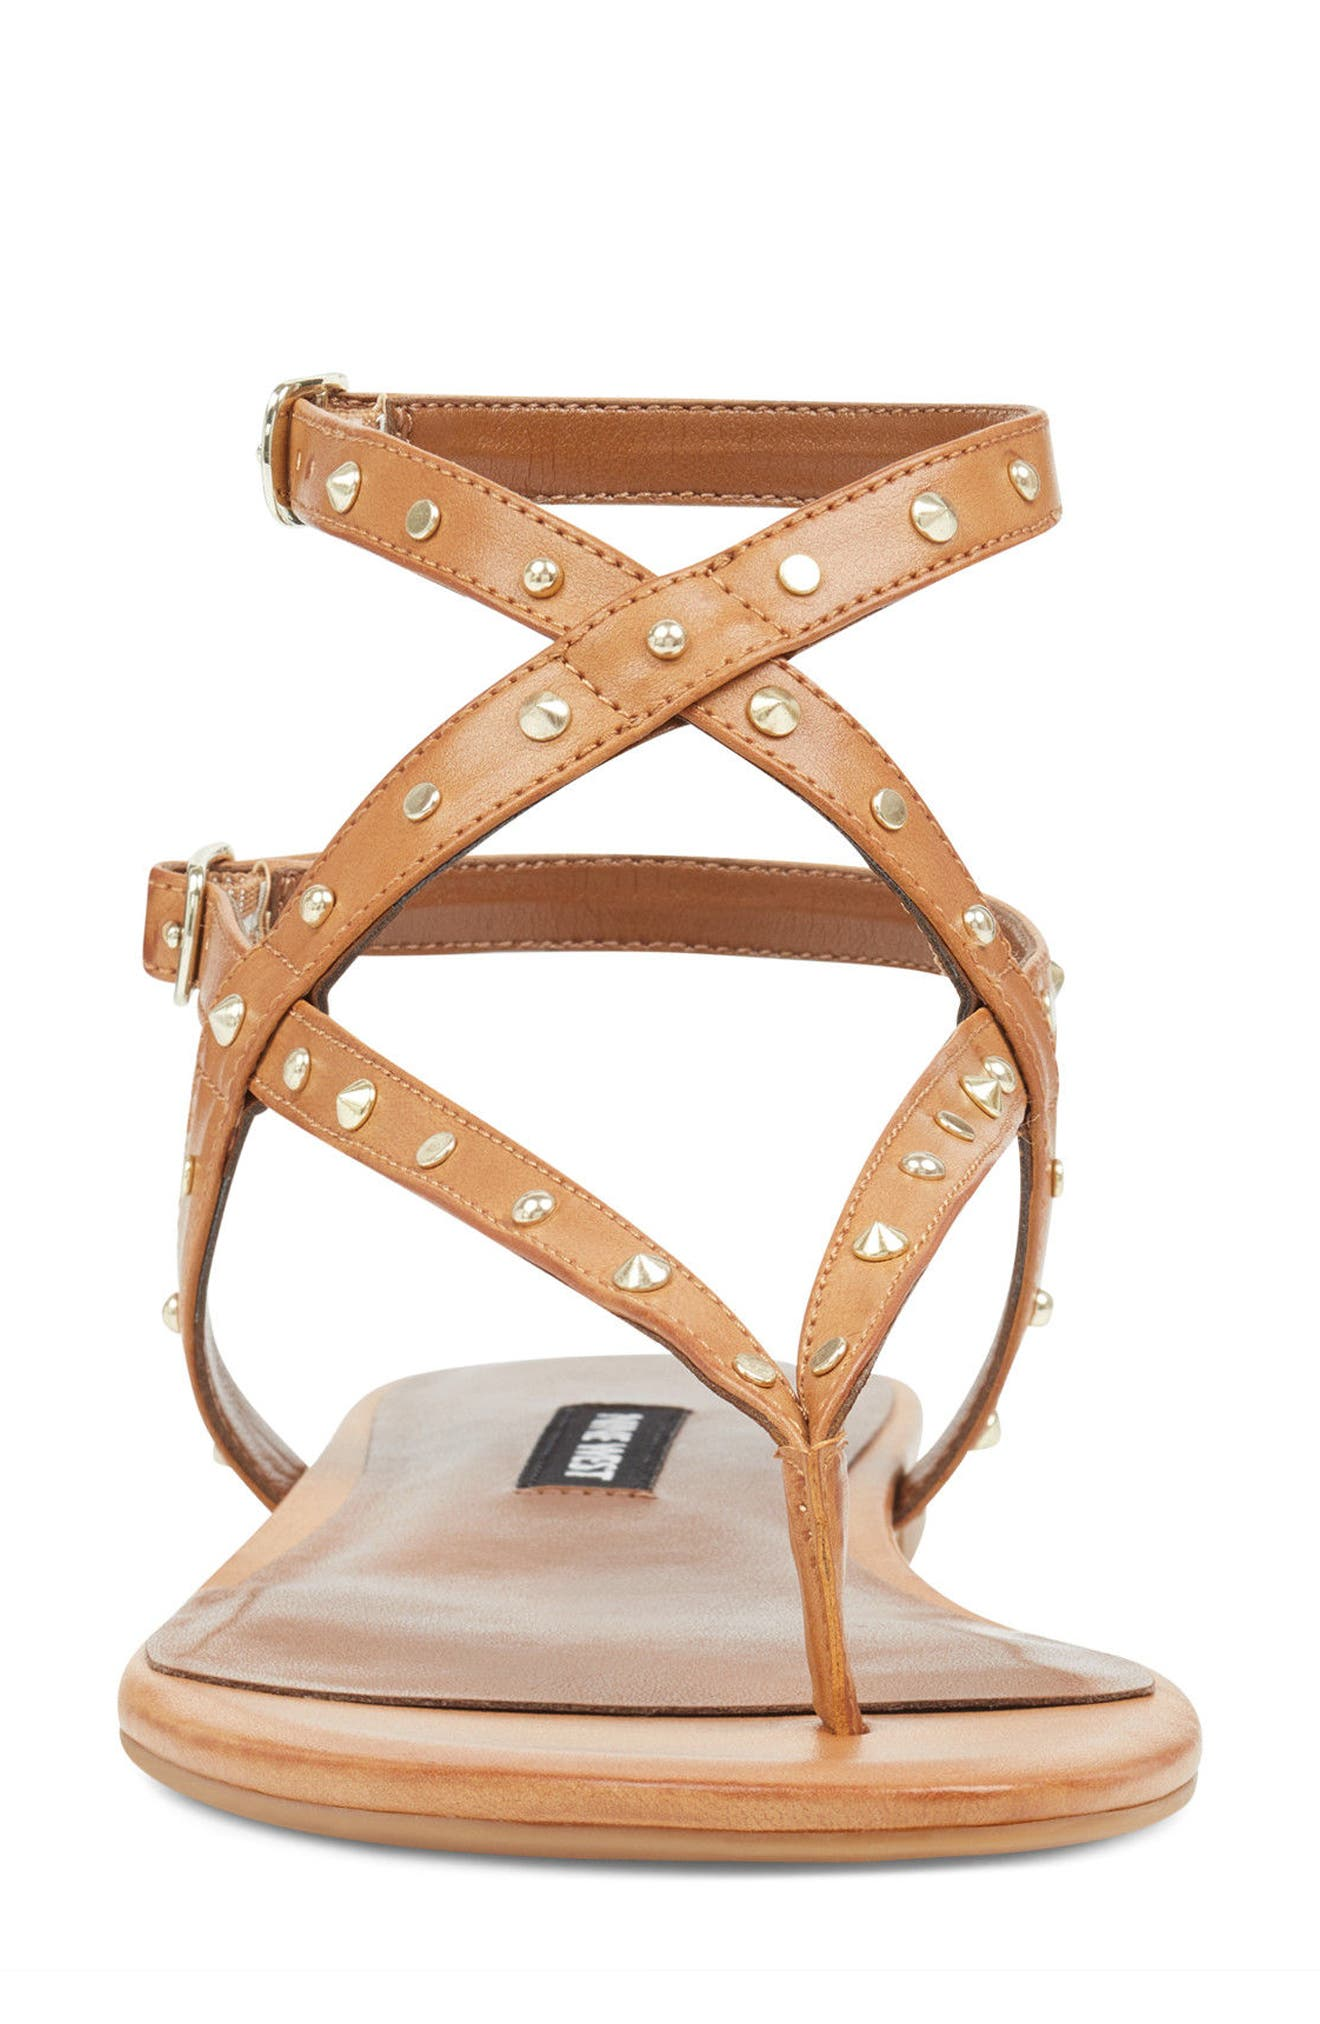 Simcha Studded Wraparound Sandal,                             Alternate thumbnail 4, color,                             Dark Natural Faux Leather